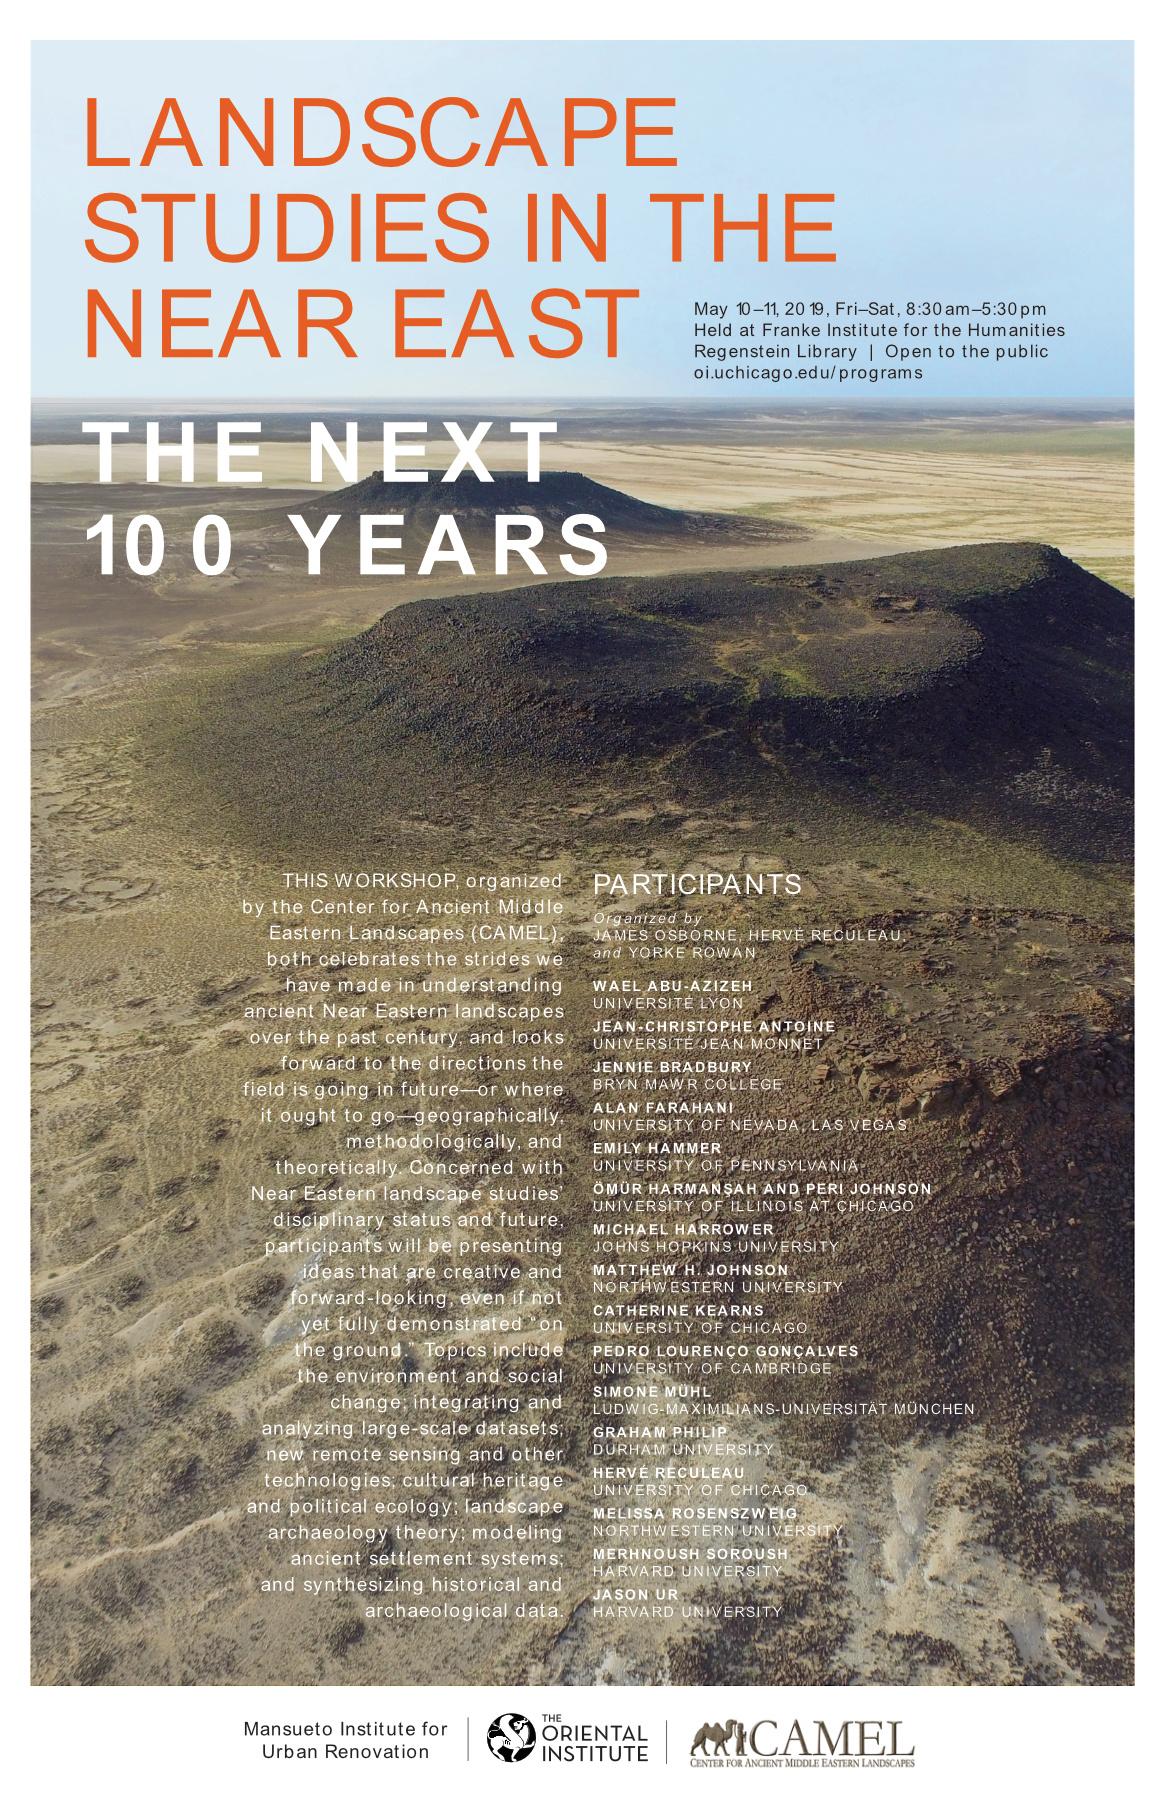 Landscape Studies in the Near East